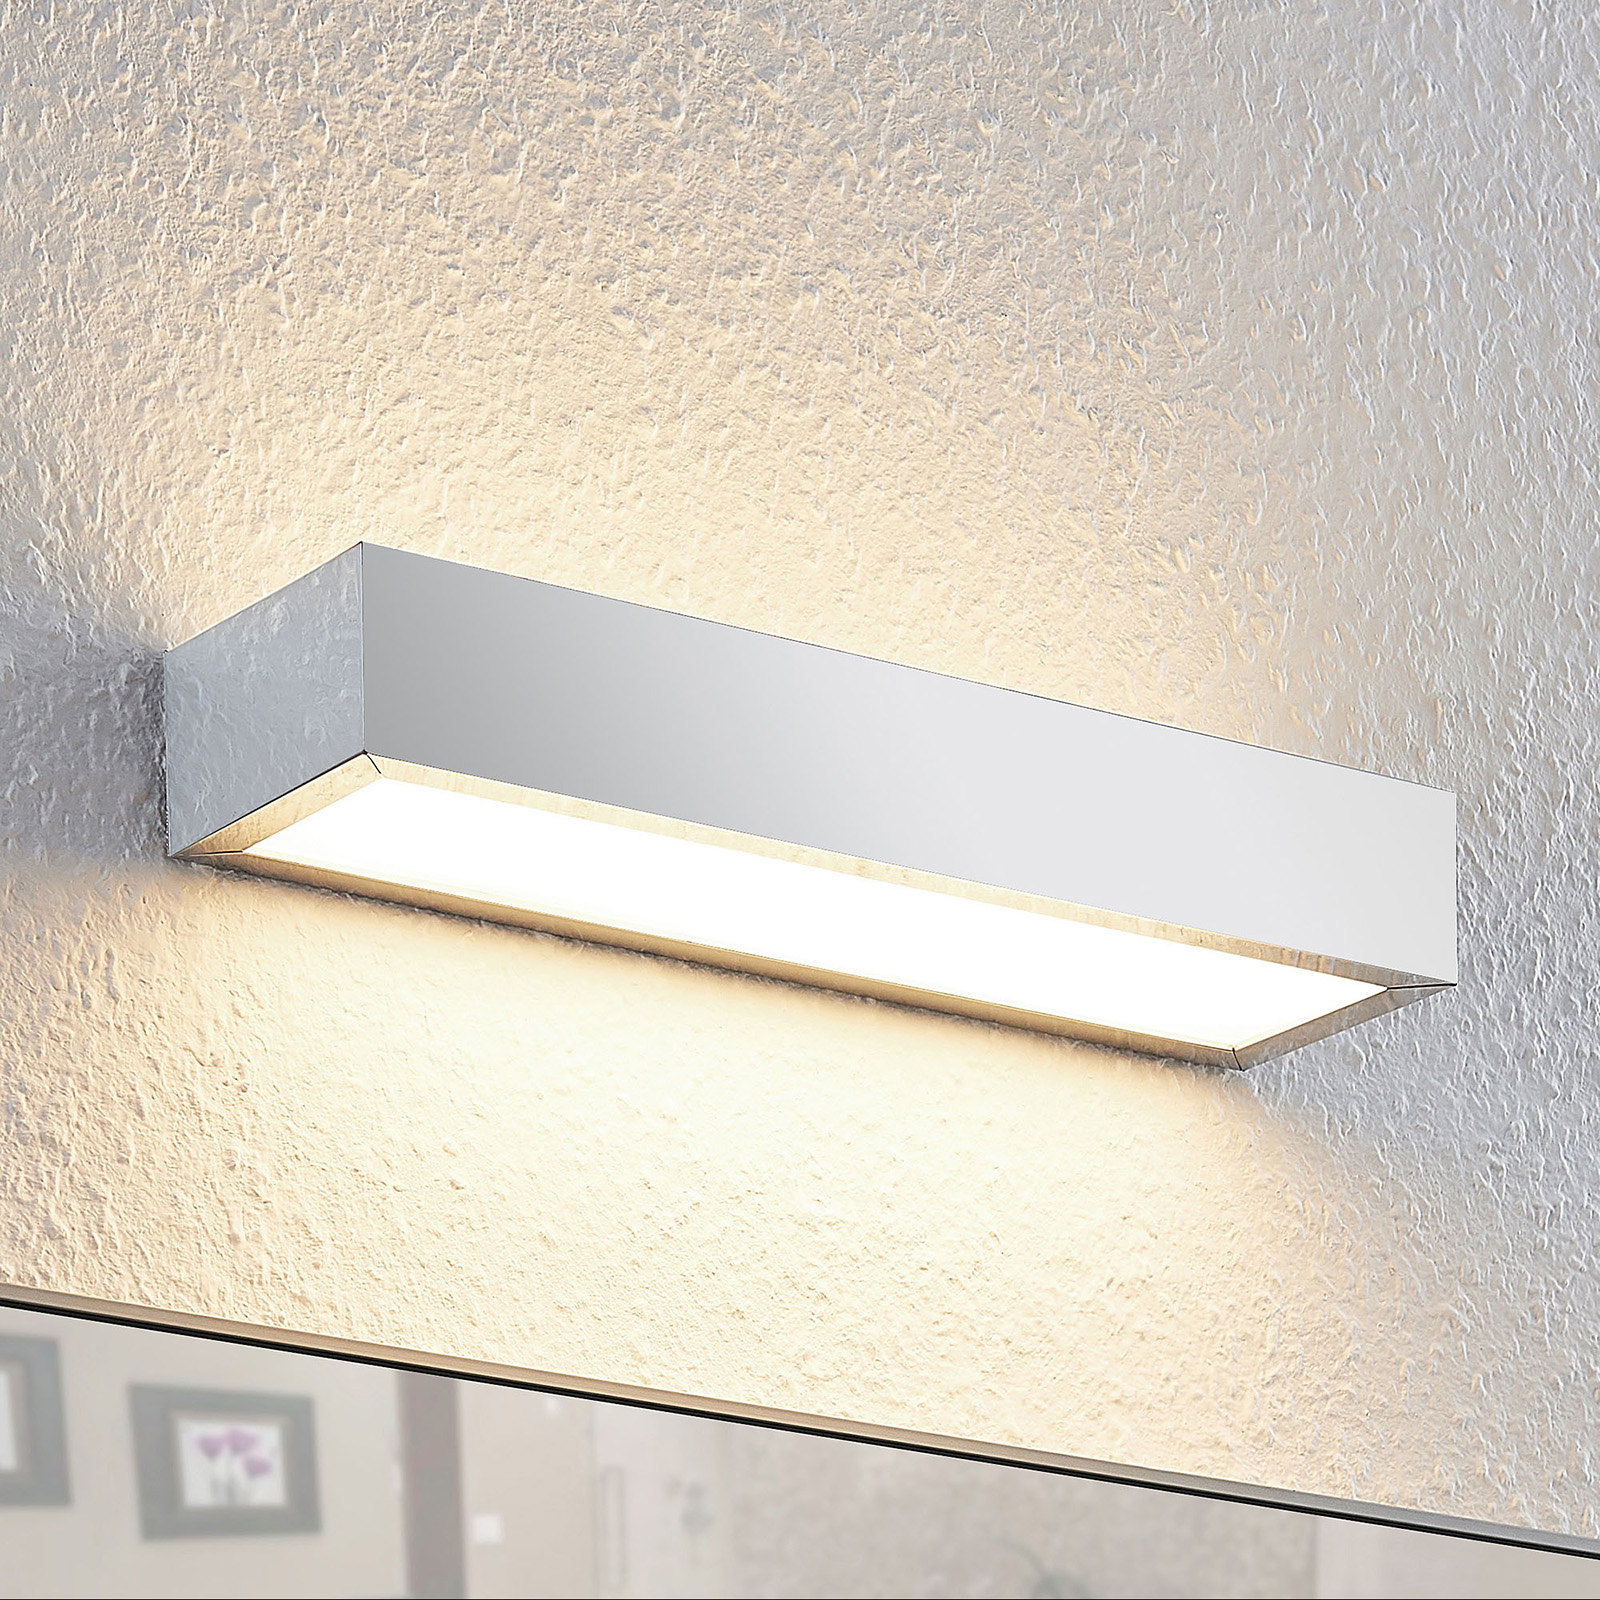 Lindby Layan LED-Bad-Wandleuchte, chrom, 30 cm